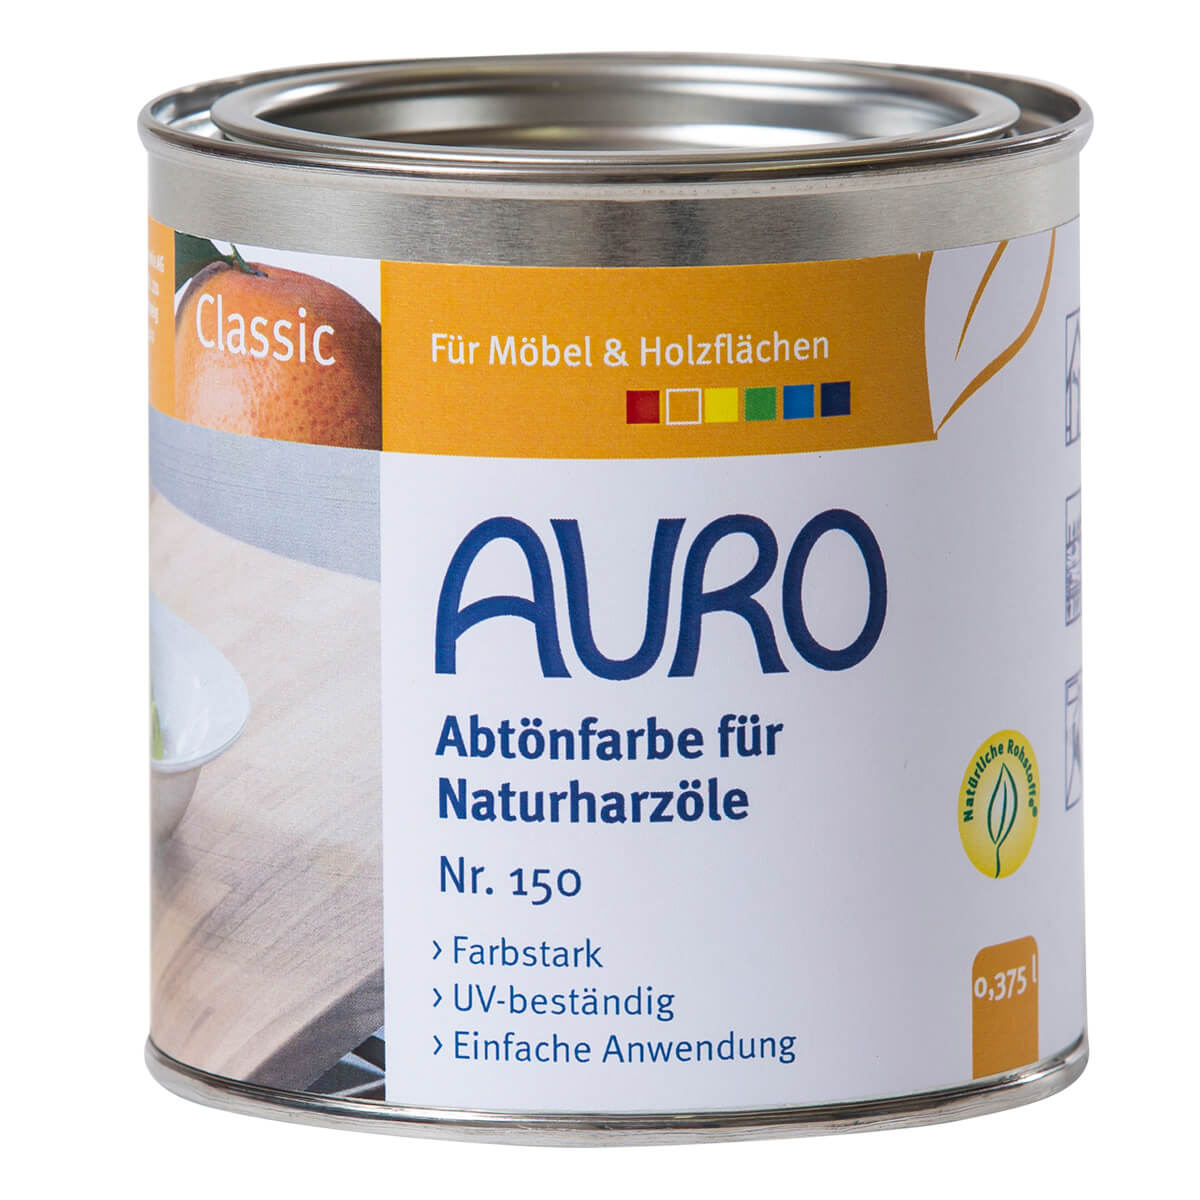 150-0.375-abtoenfarbe-fuer-naturharzoele-naturfarben